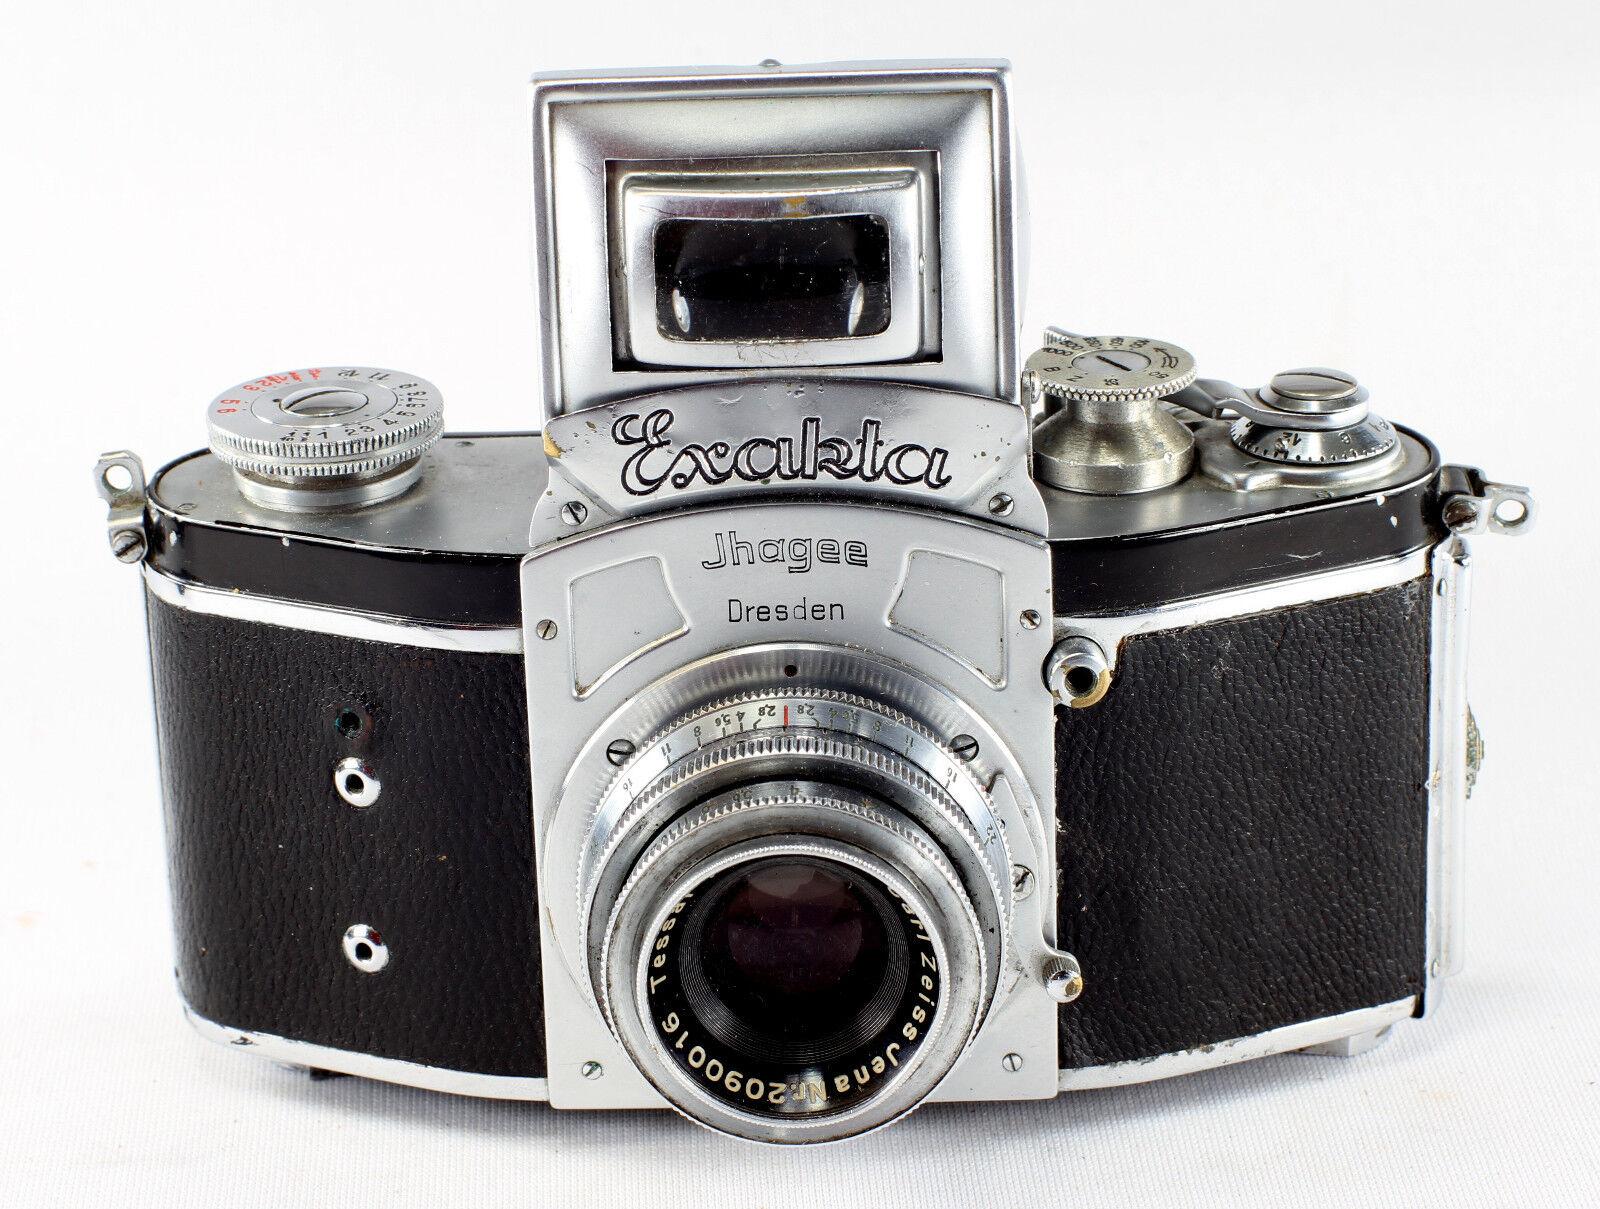 Где американцы покупают фотоаппараты